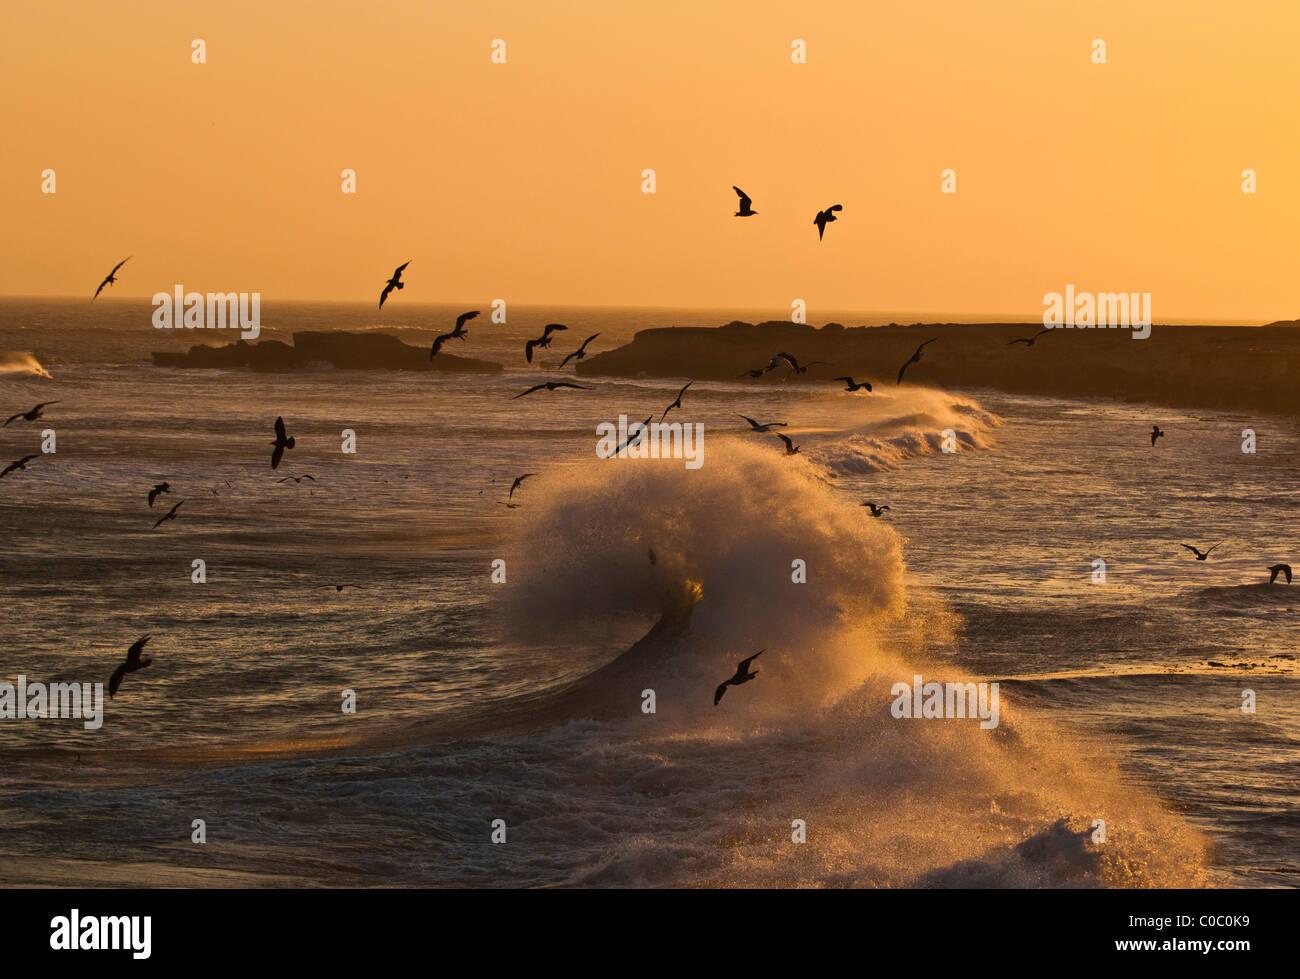 Seabirds, San Carlos, Baja California, Mexico - Stock Image